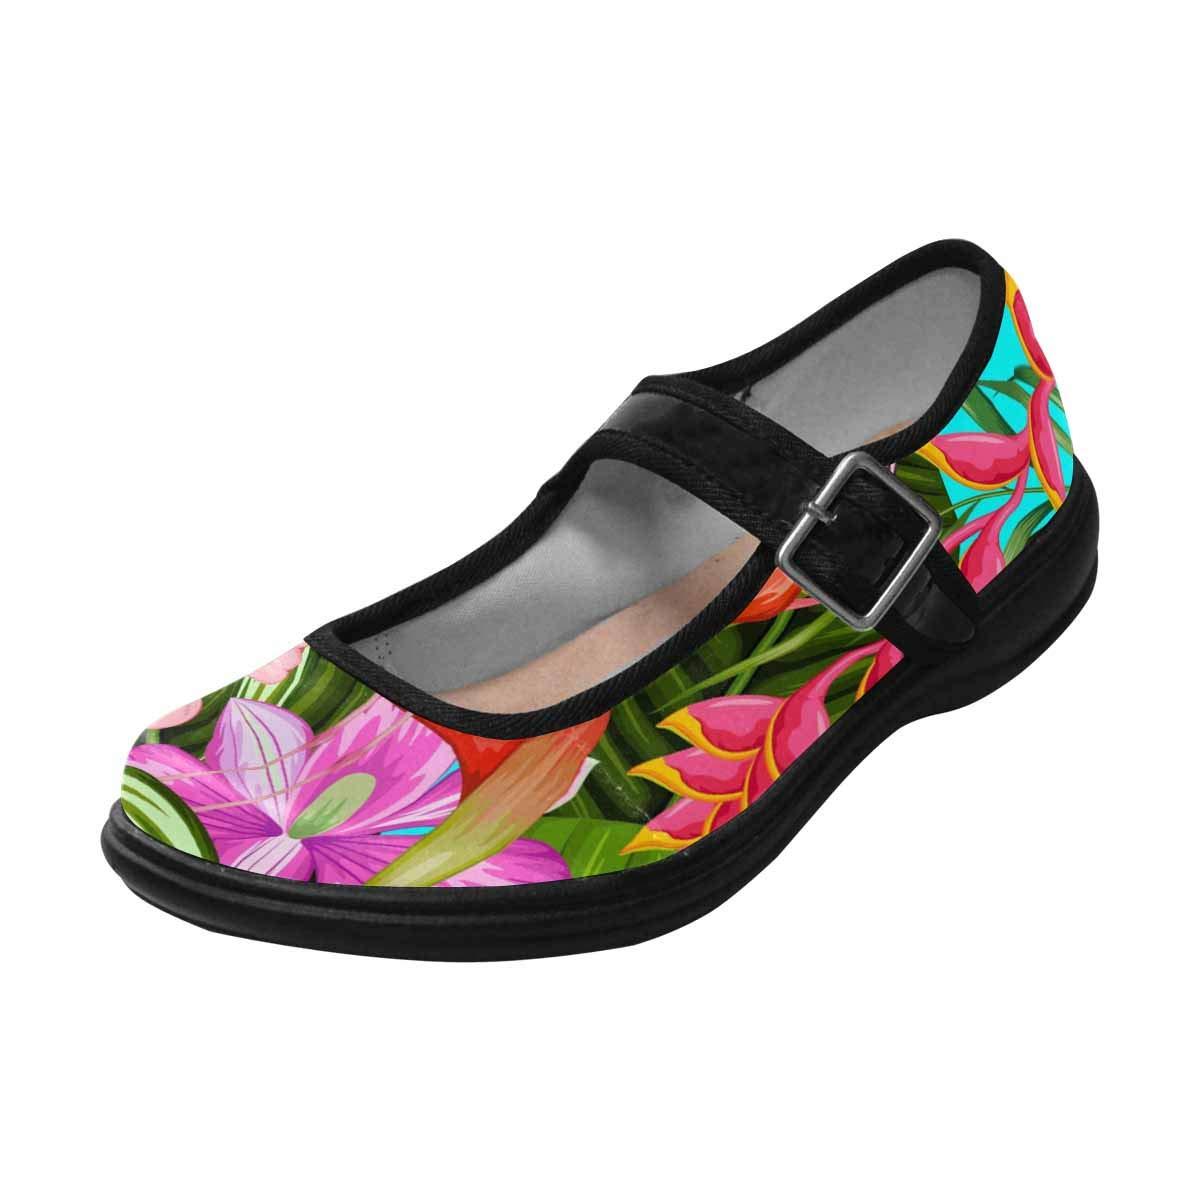 INTERESTPRINT Womens Satin Mary Jane Flats Ballet Shoes